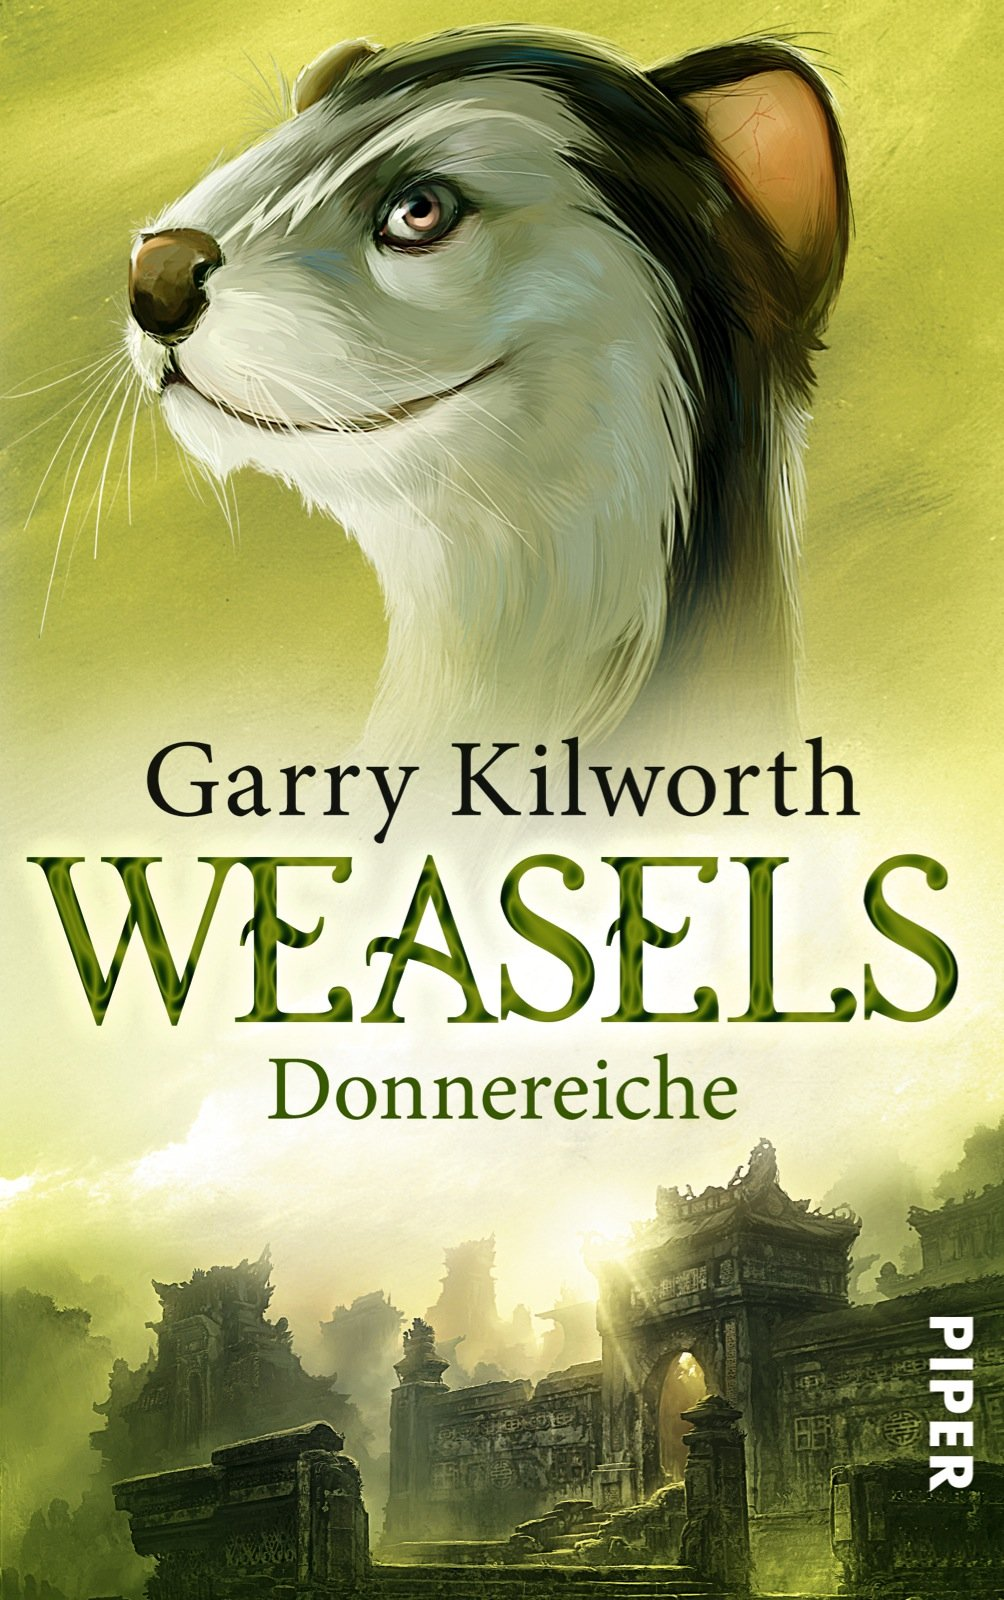 Weasels: Donnereiche: Amazon.de: Kilworth, Garry, Bonhorst, Irene ...